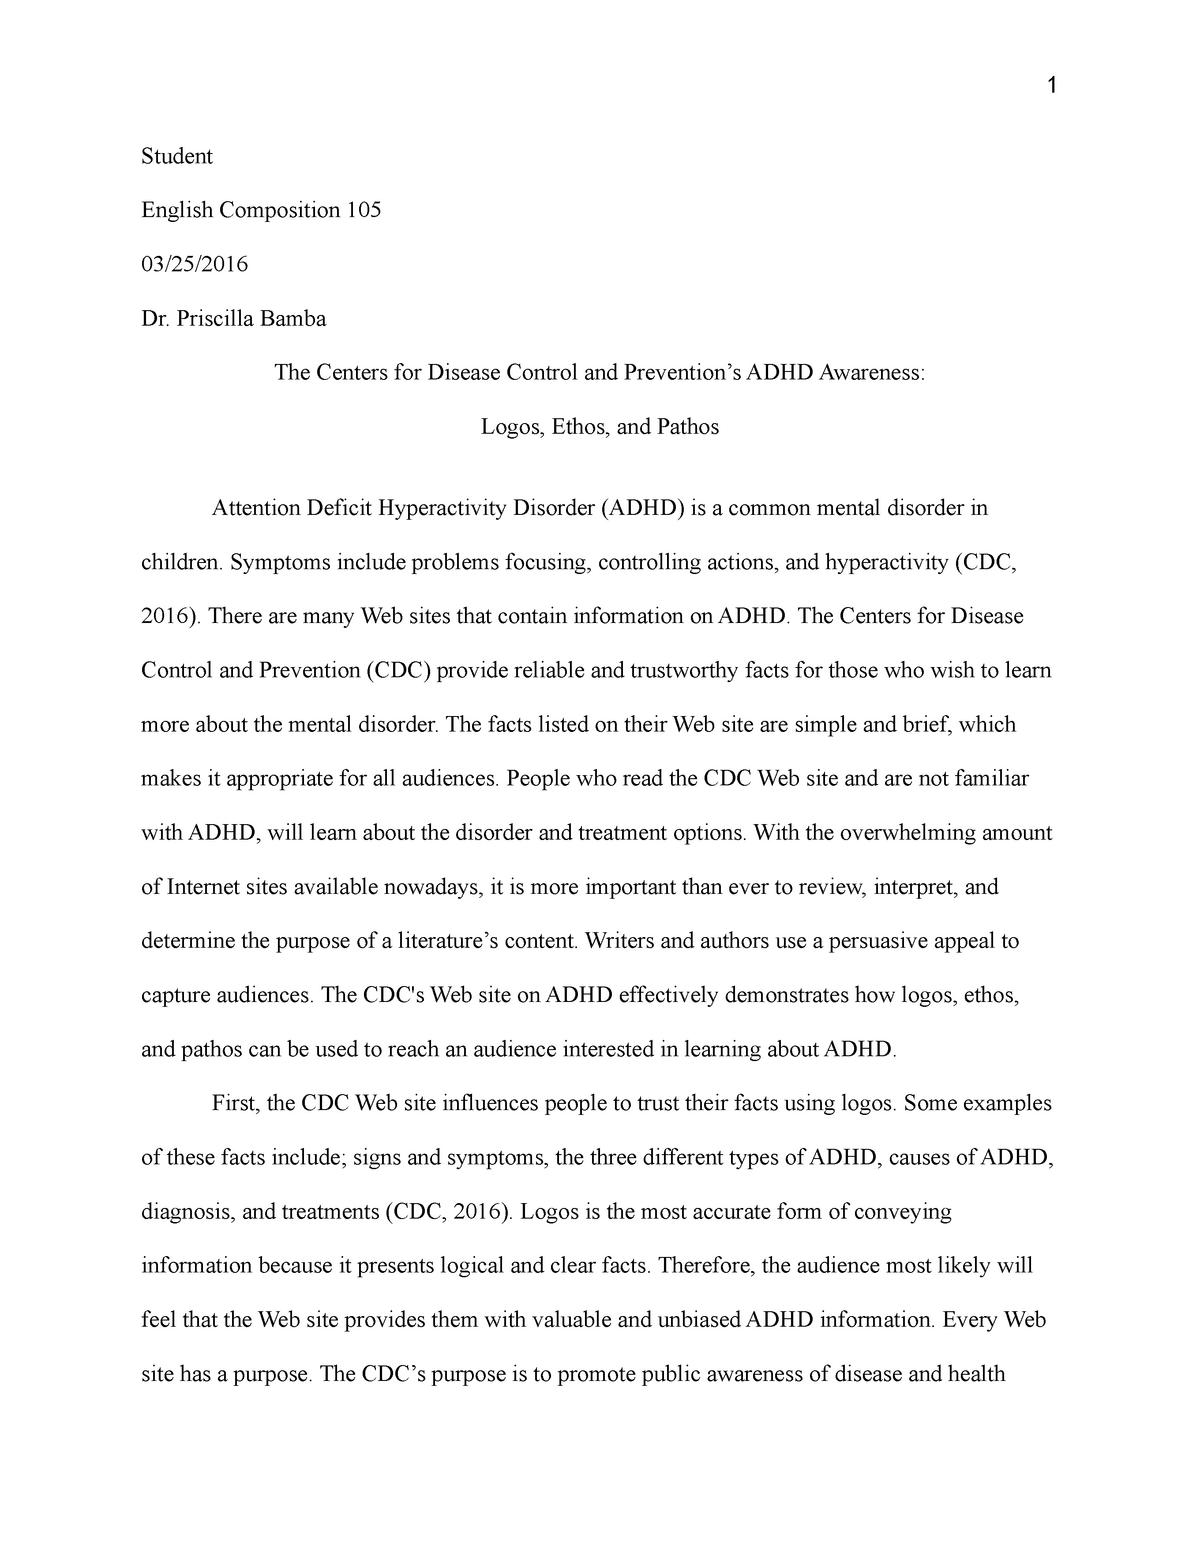 Rhetorical analysis essay samples how to write like an anthropologist